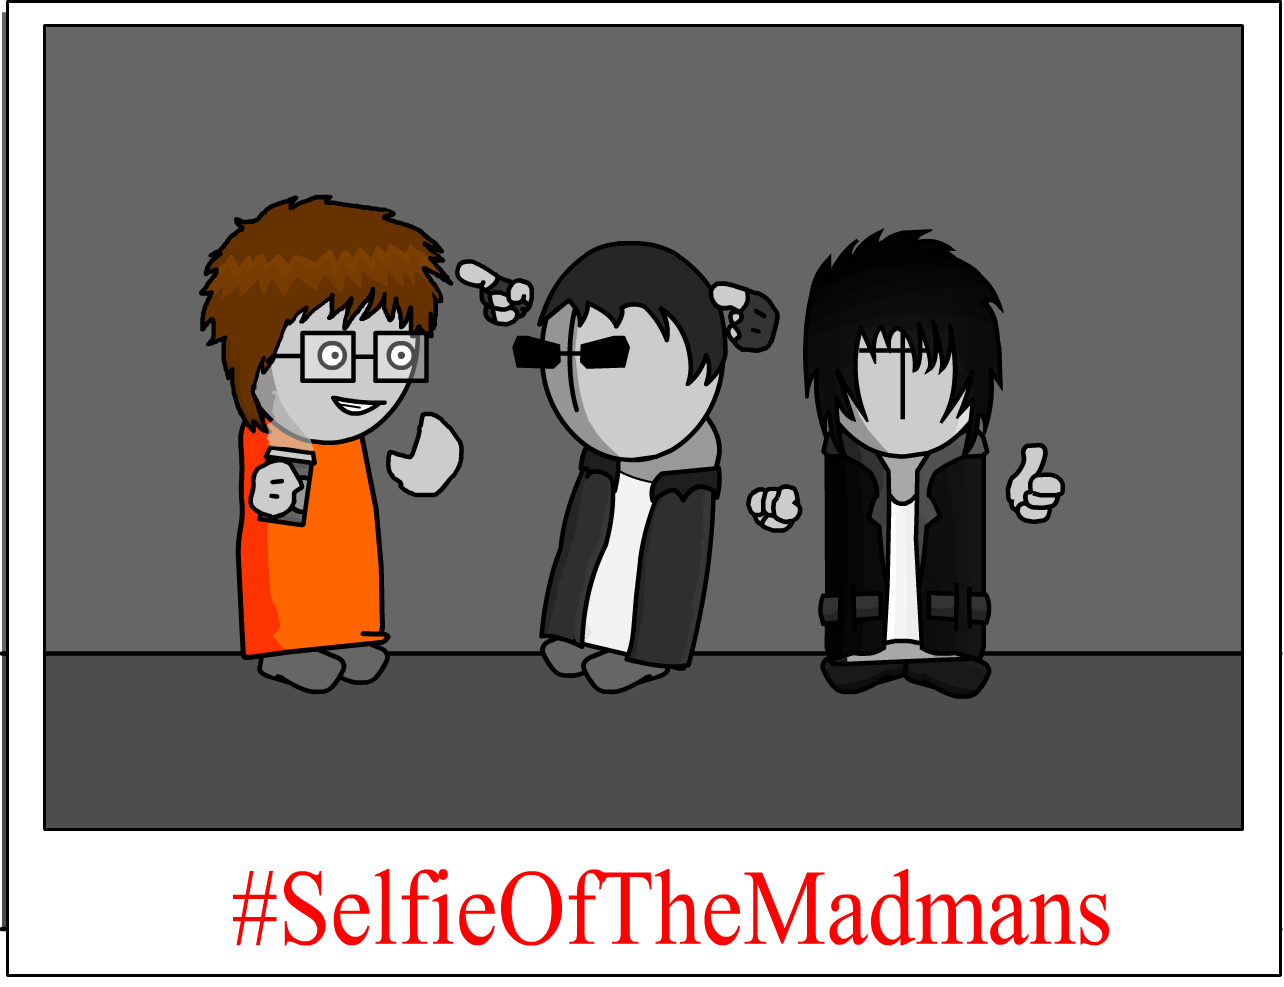 #SelfieOfTheMadmans